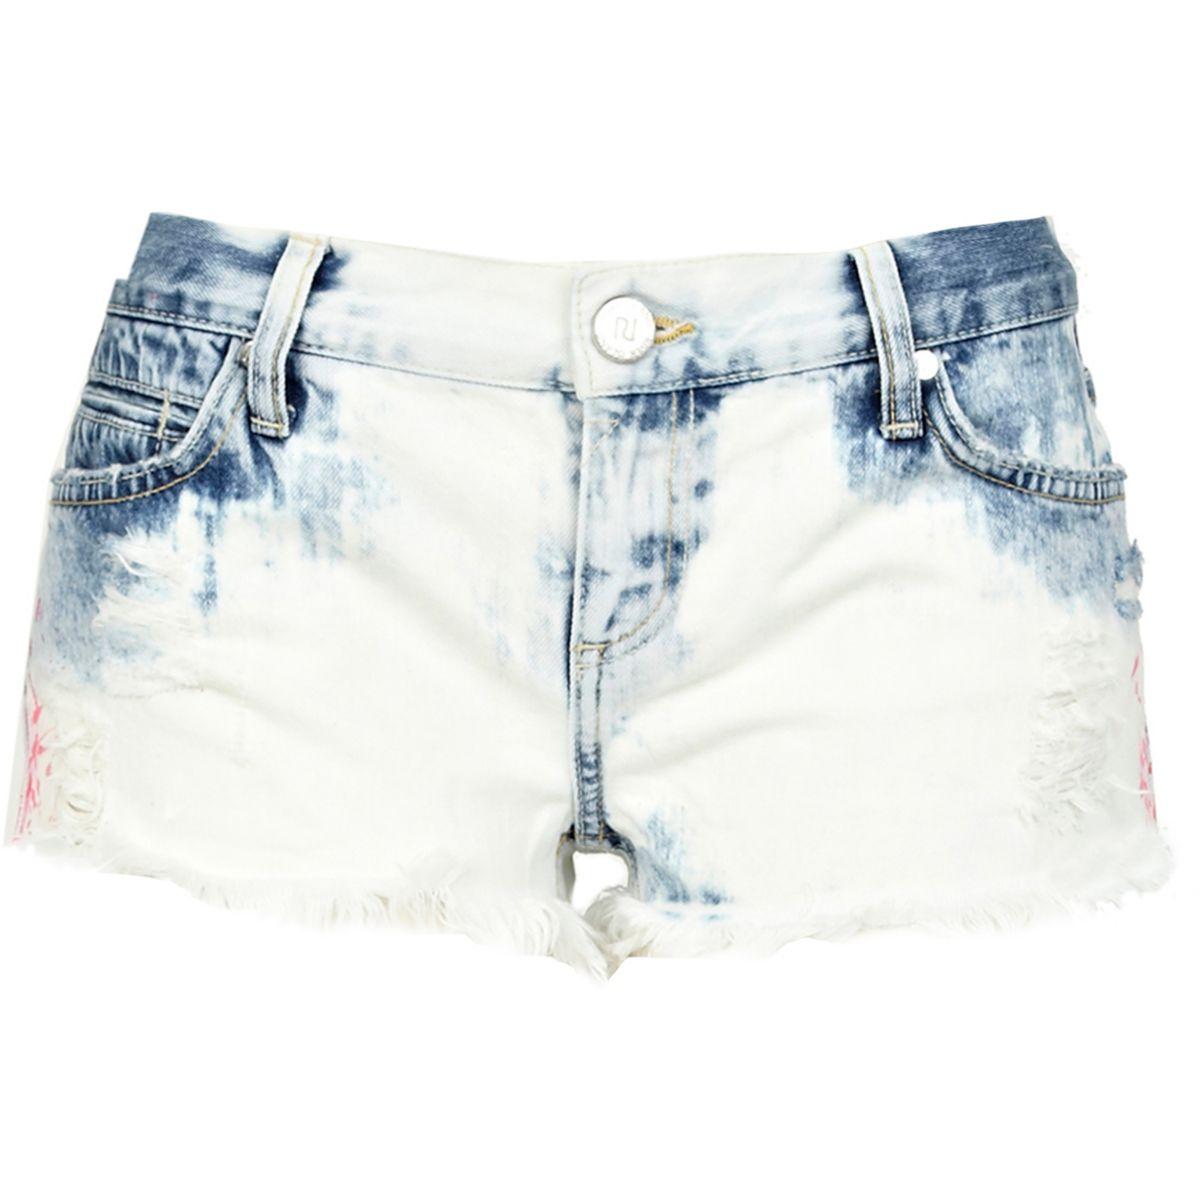 Light acid wash frayed denim shorts